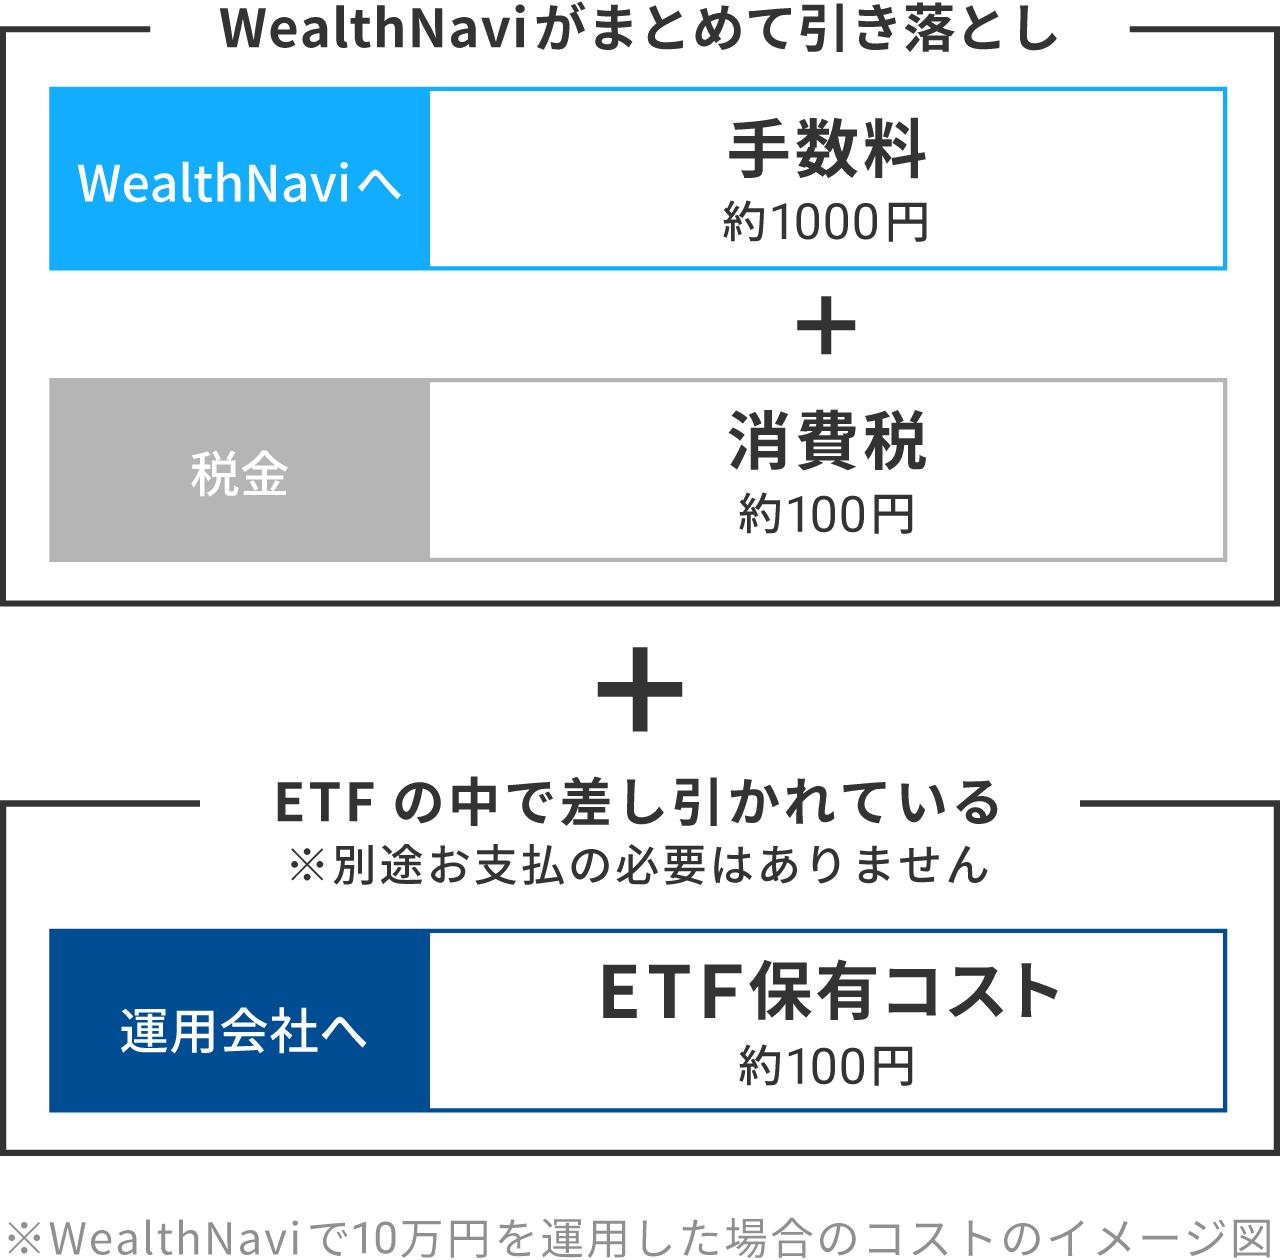 WealthNaviで10万円を運用した場合のコストのイメージ図